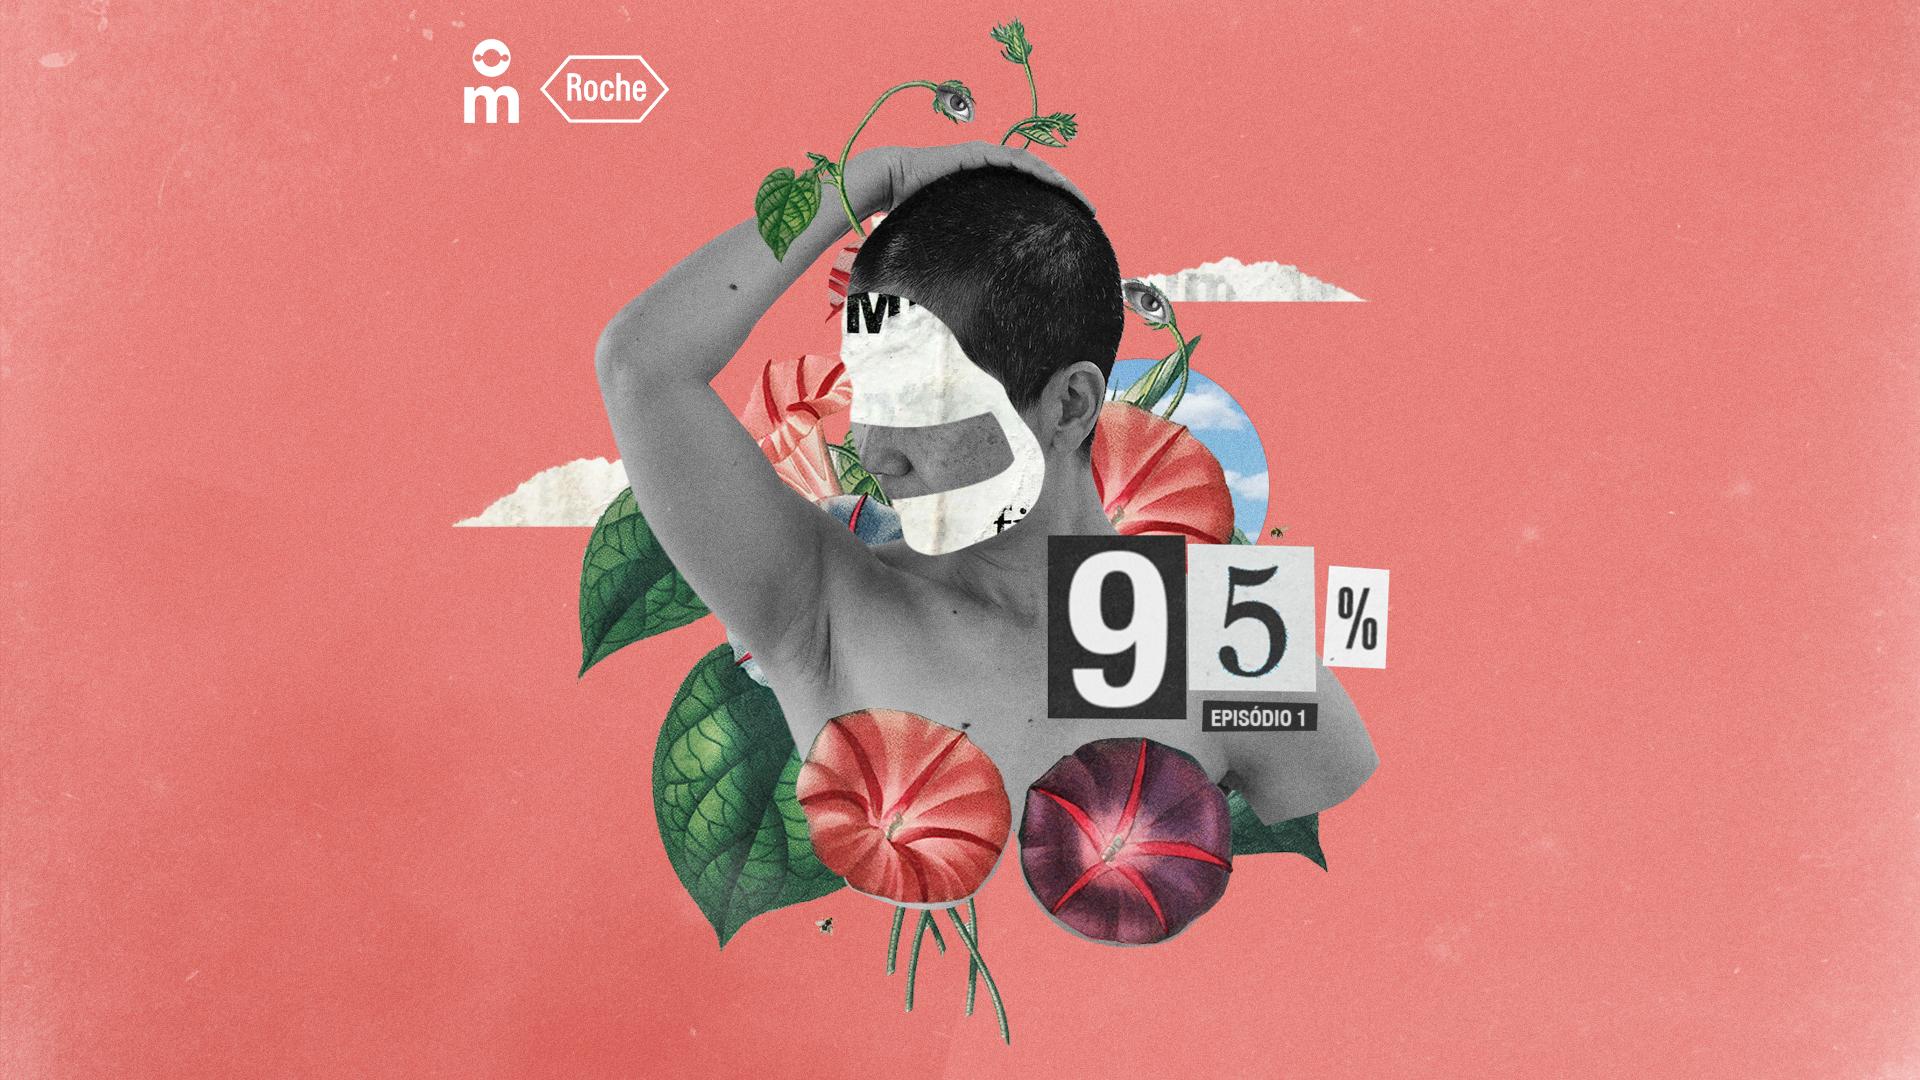 95-episodio-1